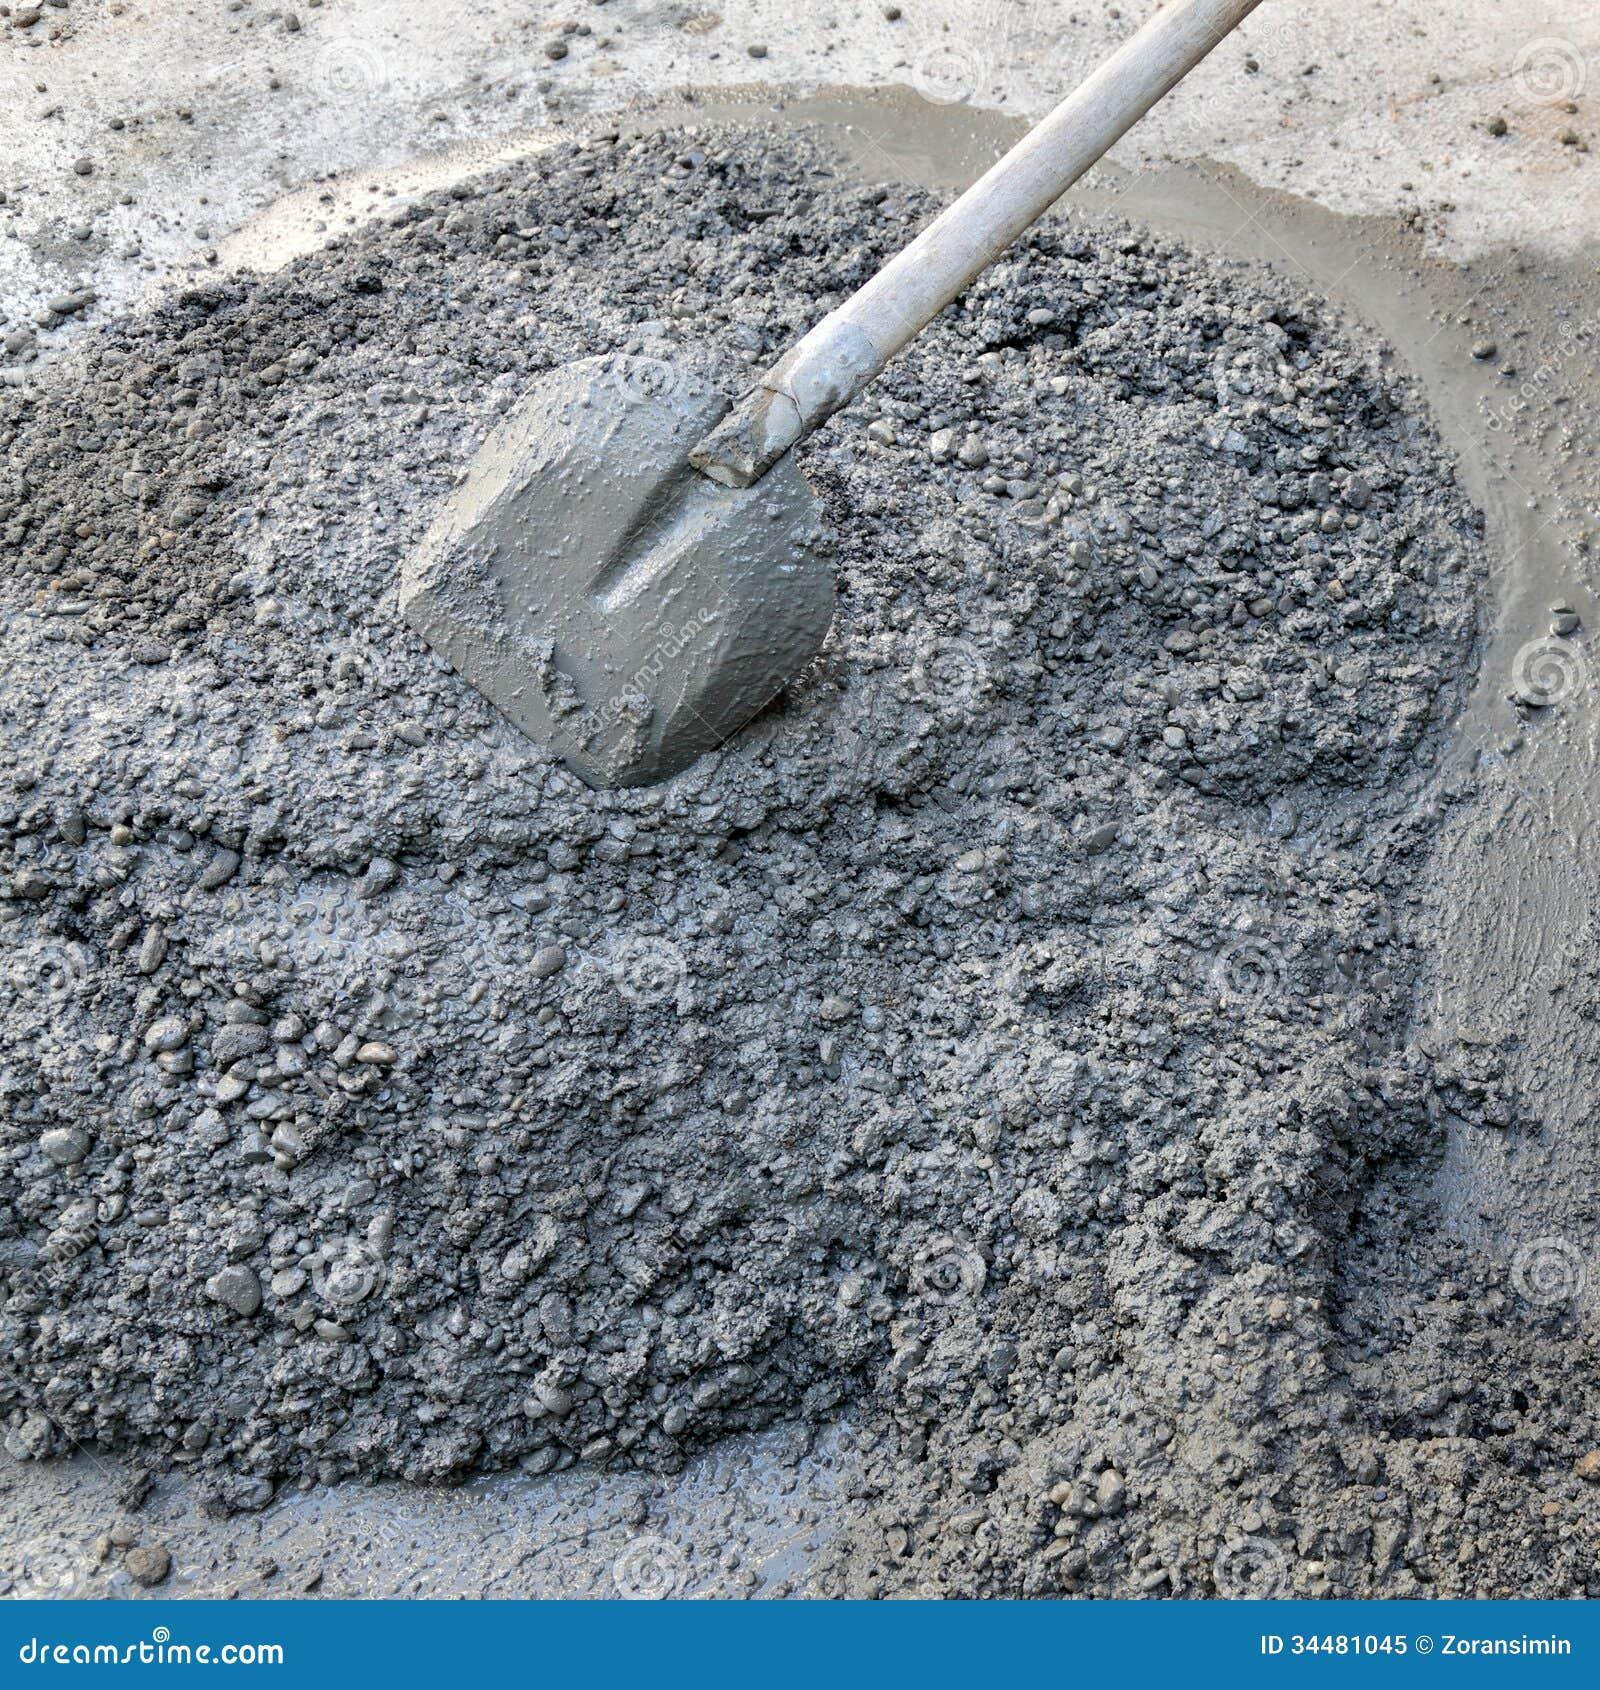 Concrete Mixing Animation : Concrete and shovel royalty free stock photo image